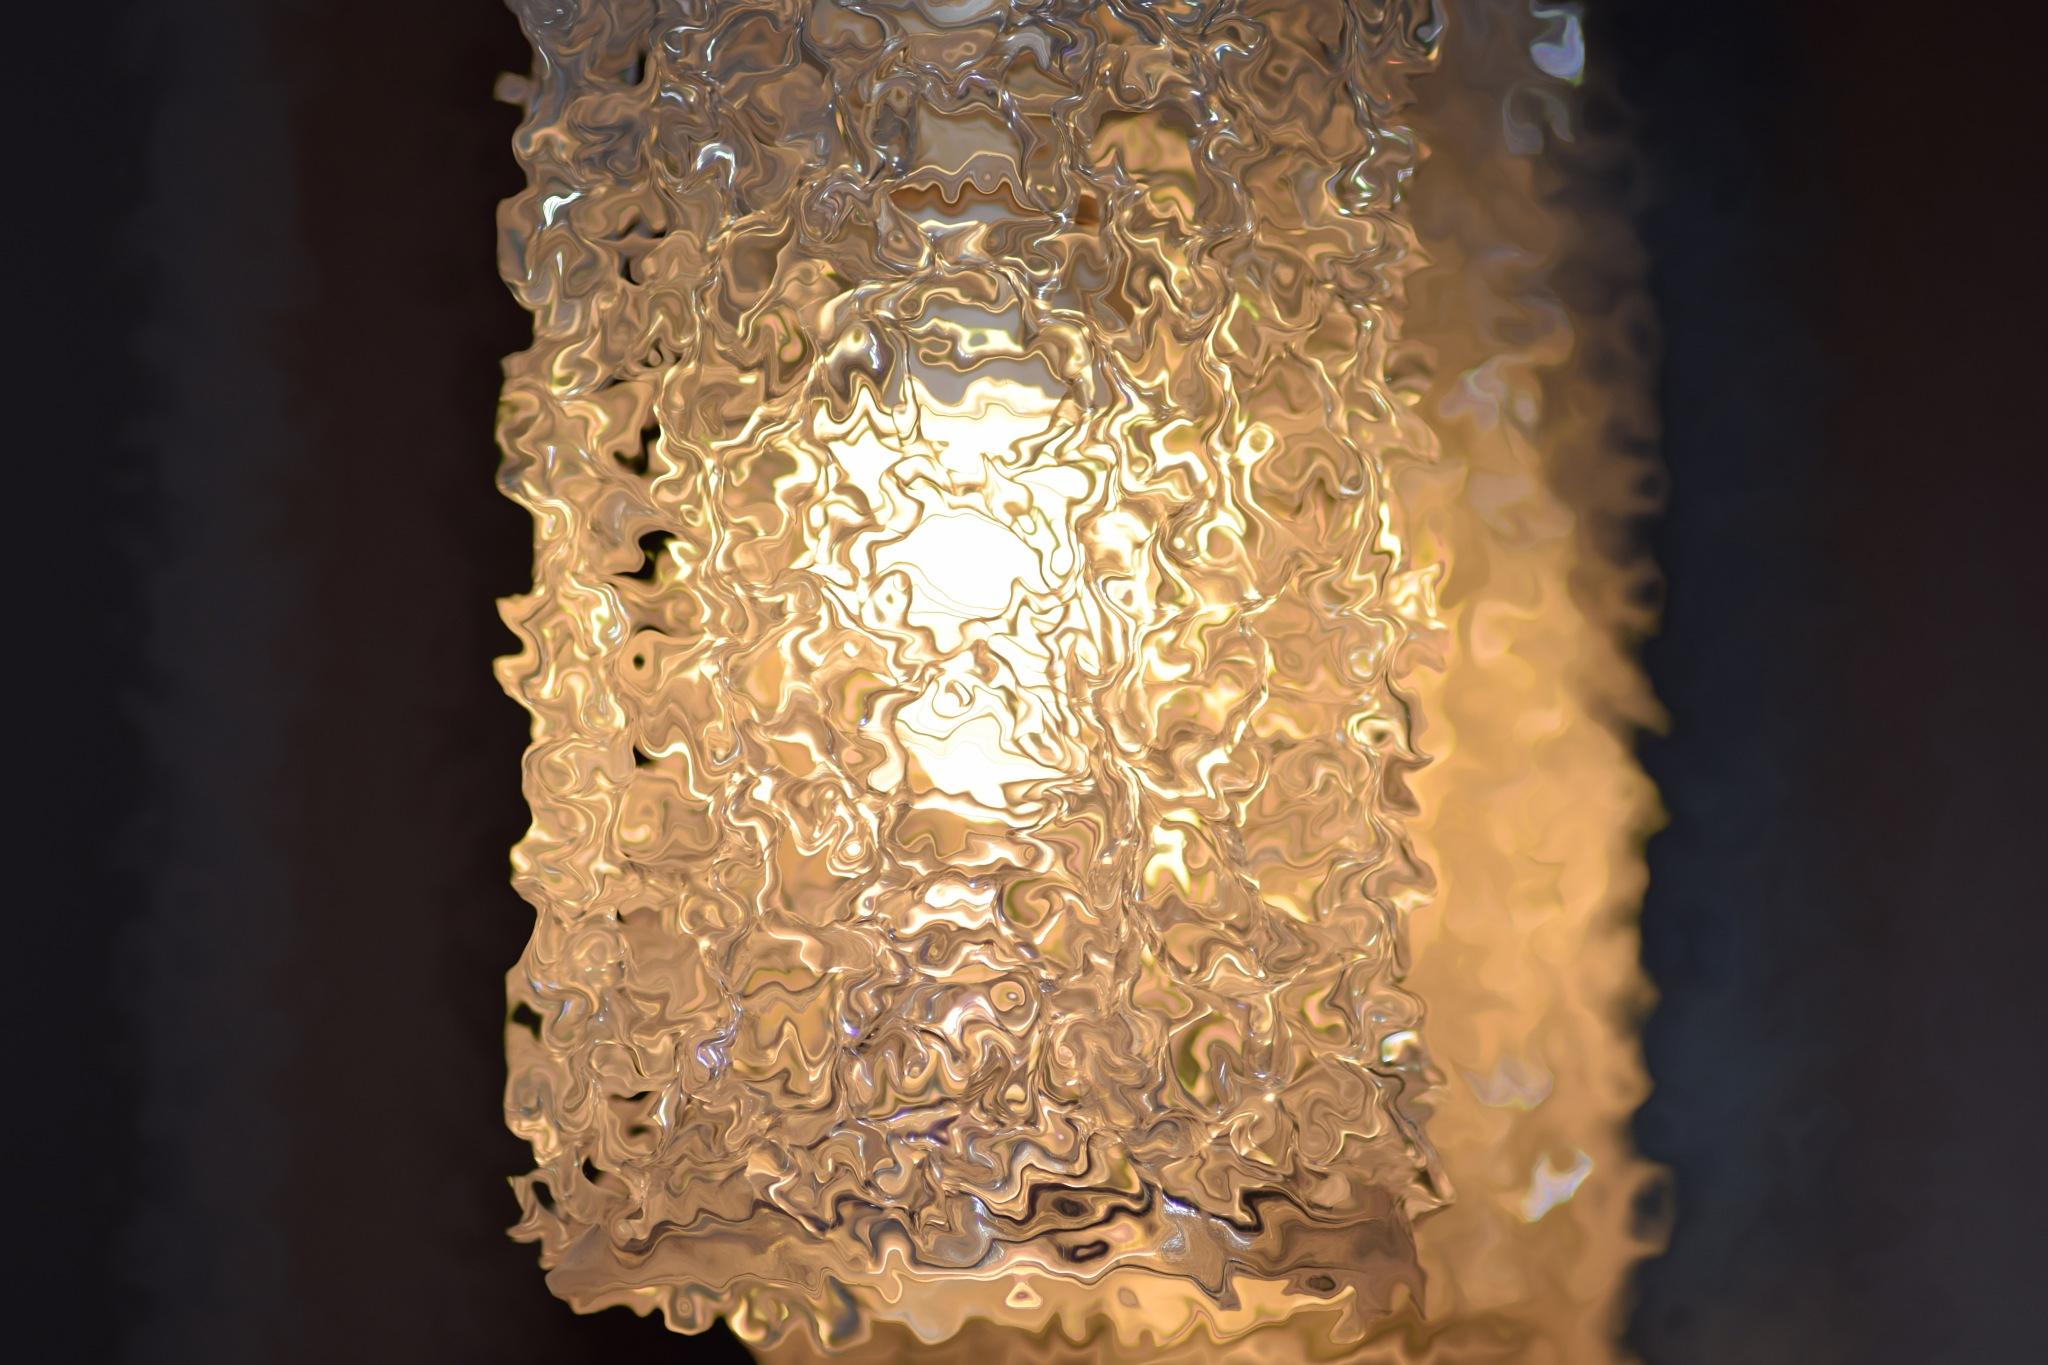 Smelting Lamp_Conzept_1 by PeterHaselstoner